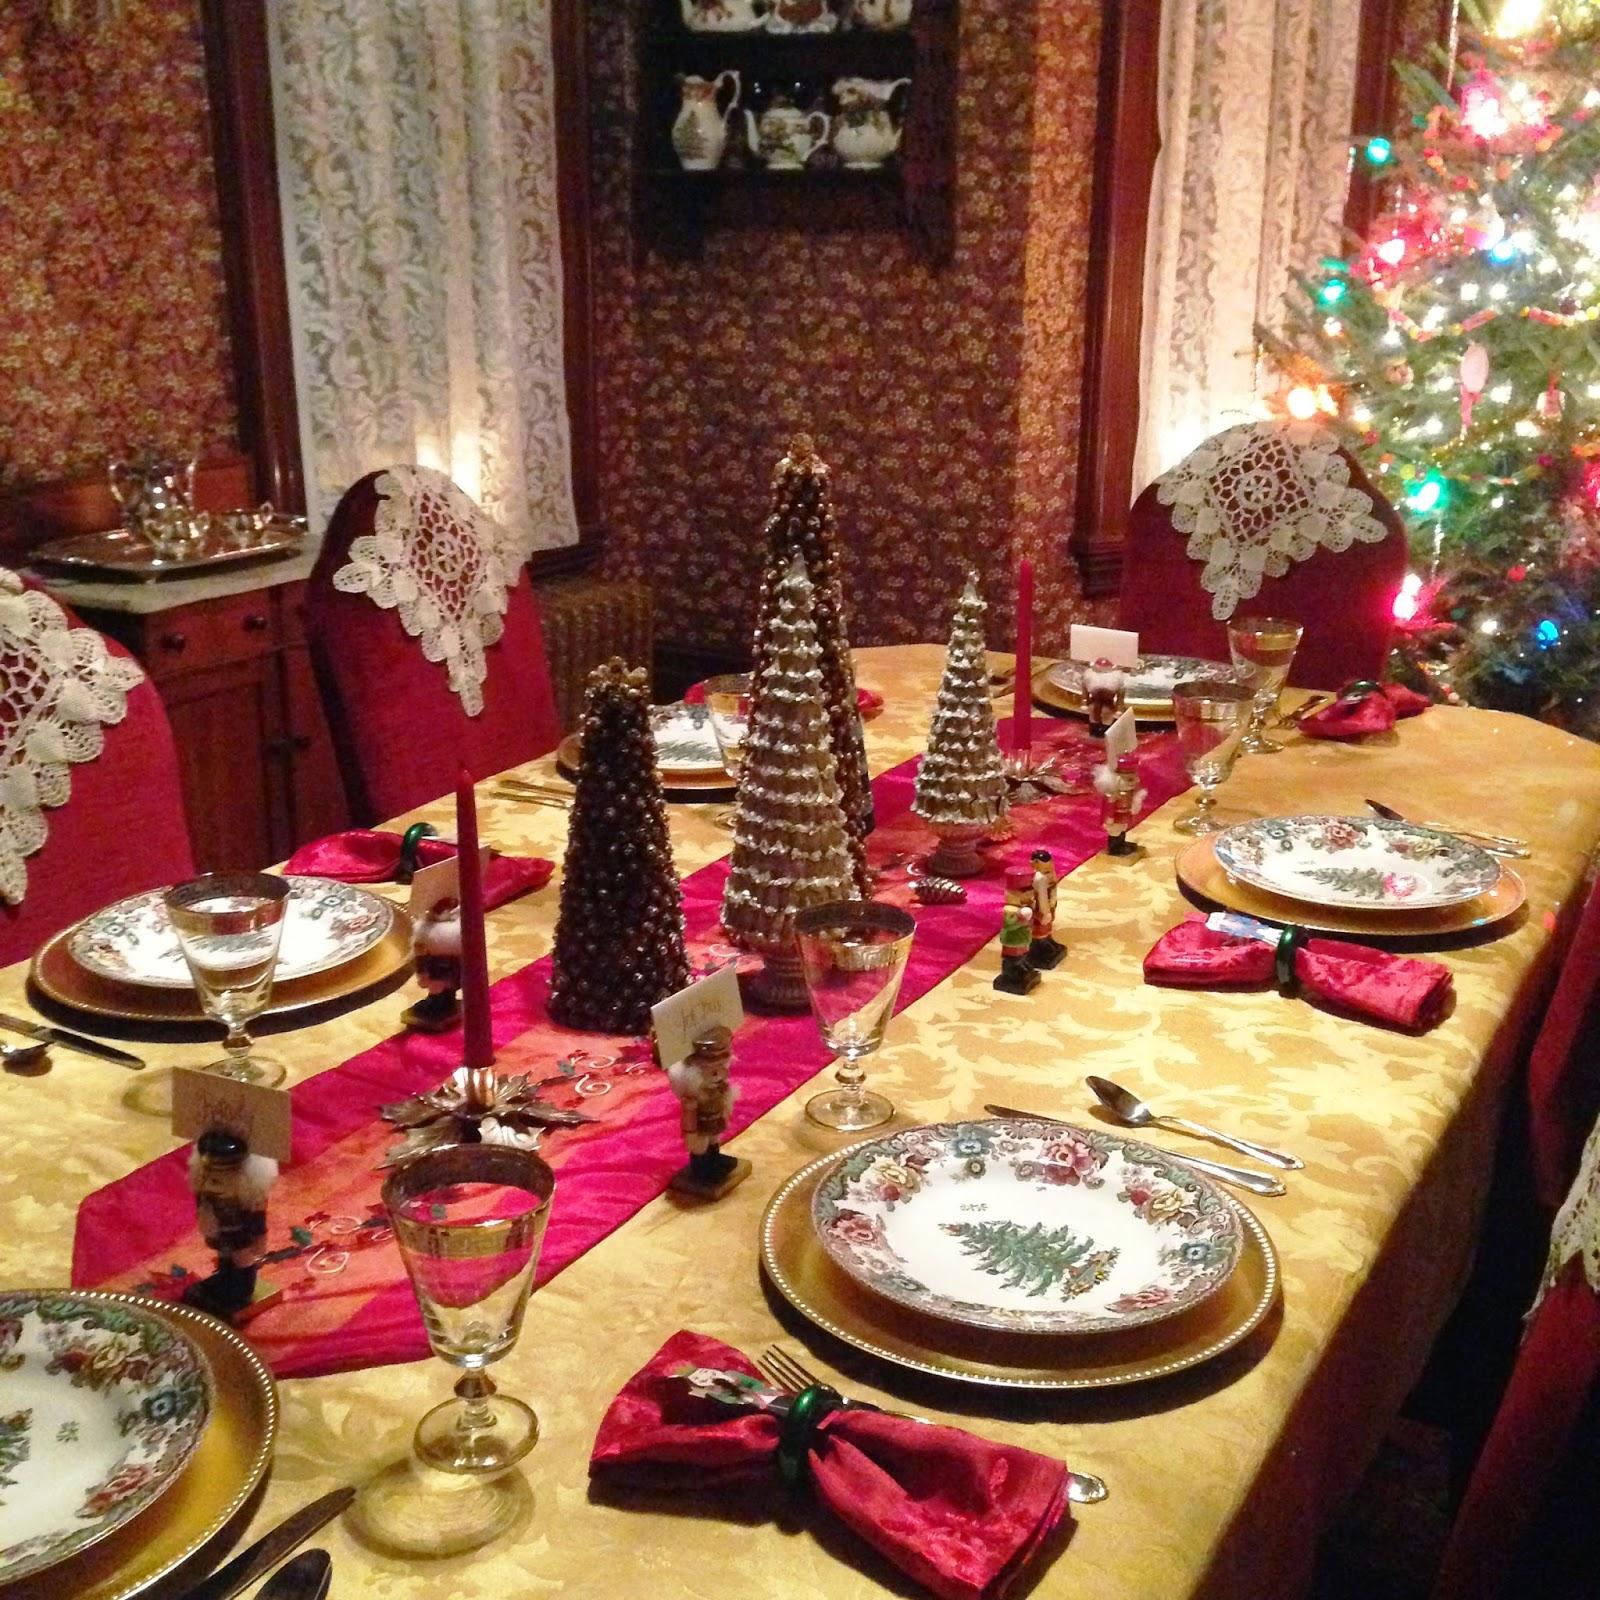 carolinajewel's table: Christmas all through the House